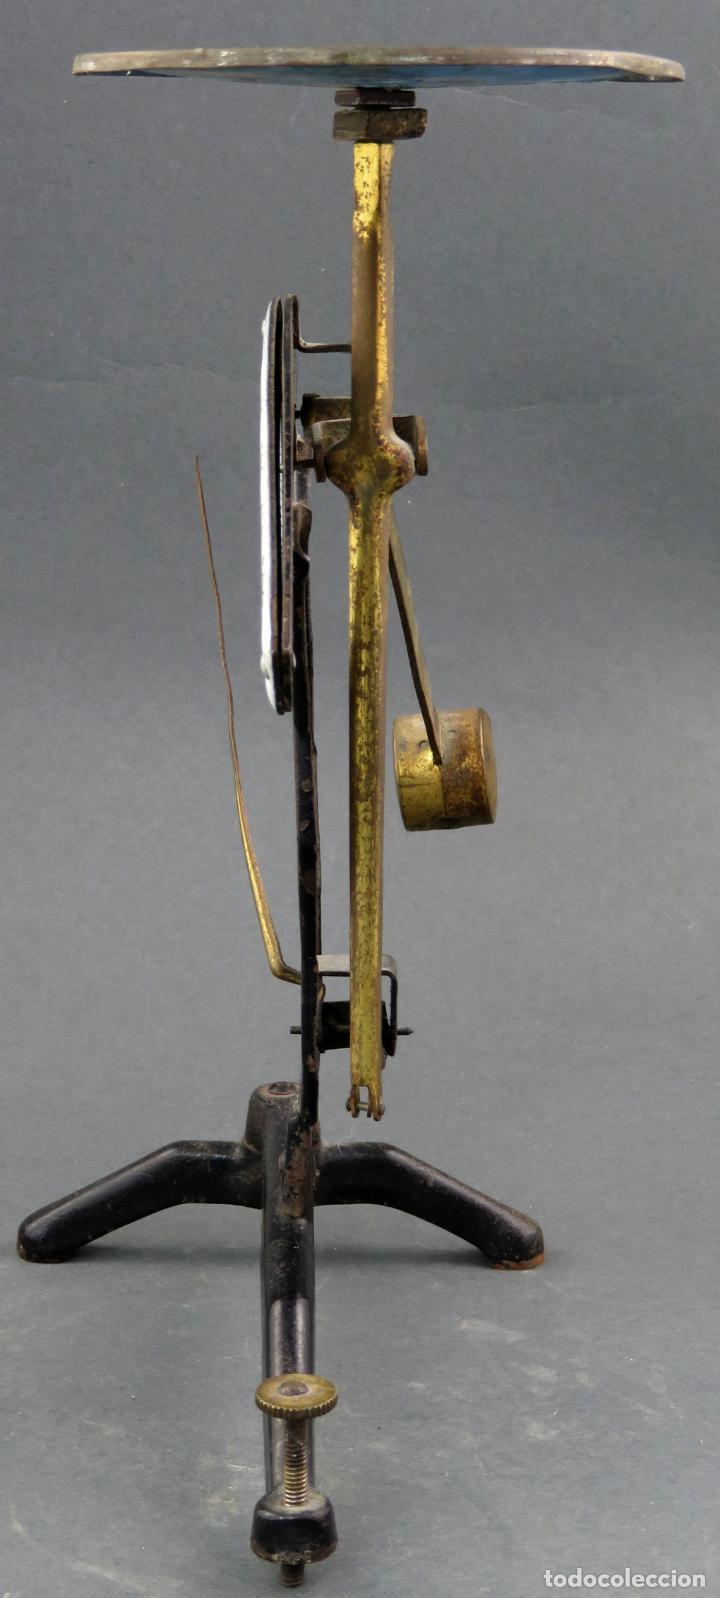 Antigüedades: Bascula balanza española postal pesar cartas correo en hierro Jmaz principios siglo XX - Foto 3 - 142681646